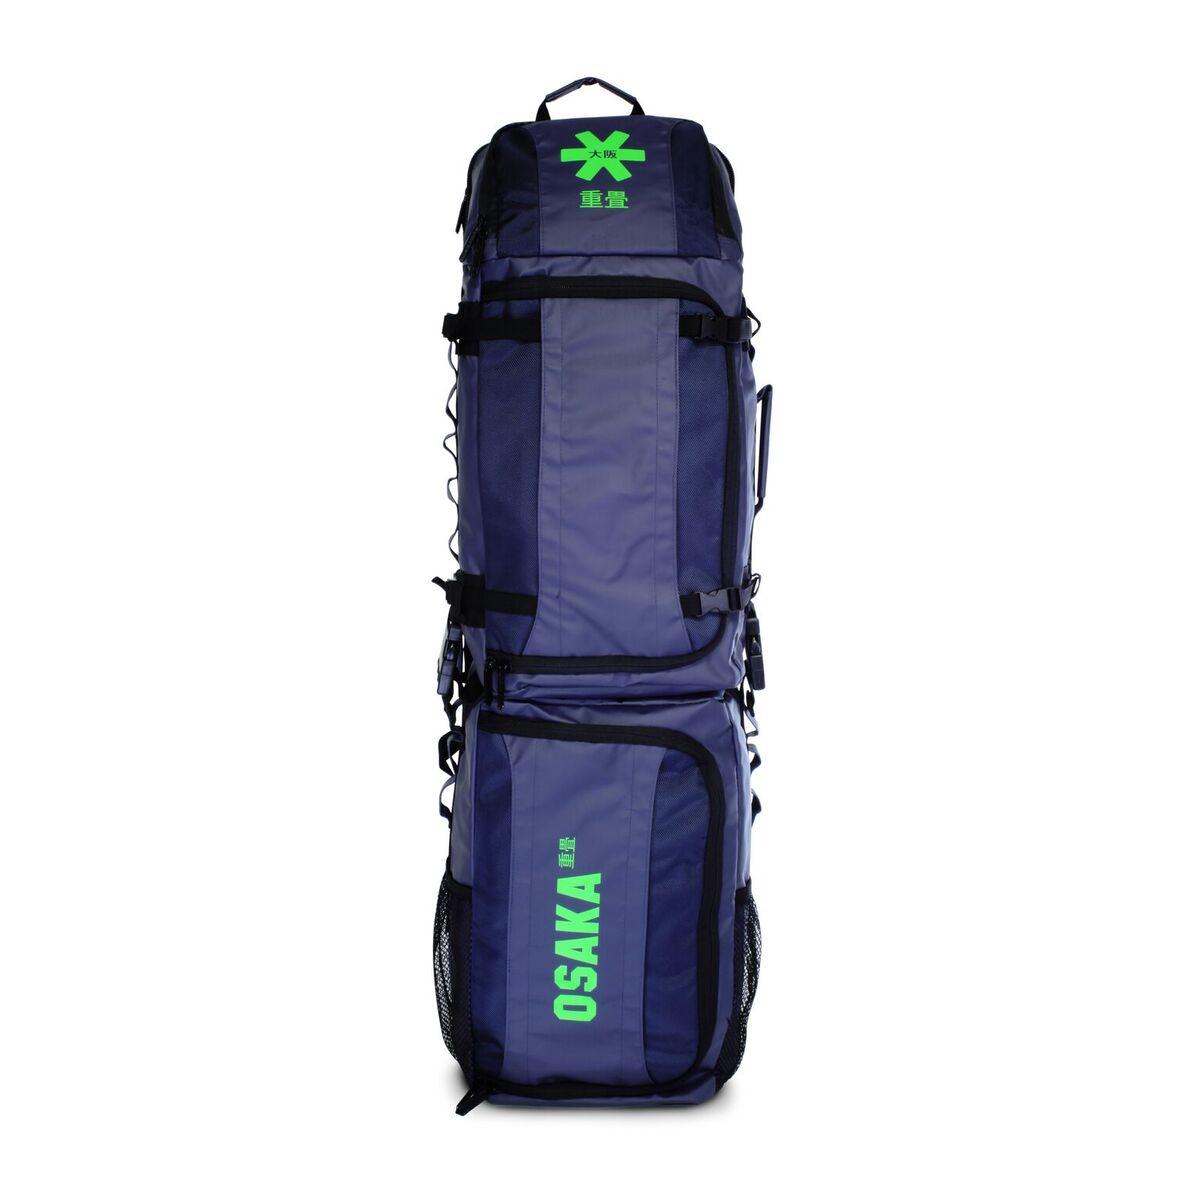 f8584bec16 Osaka SP Custom Bag Navy Green - Hockey Bags Dublin - Ireland